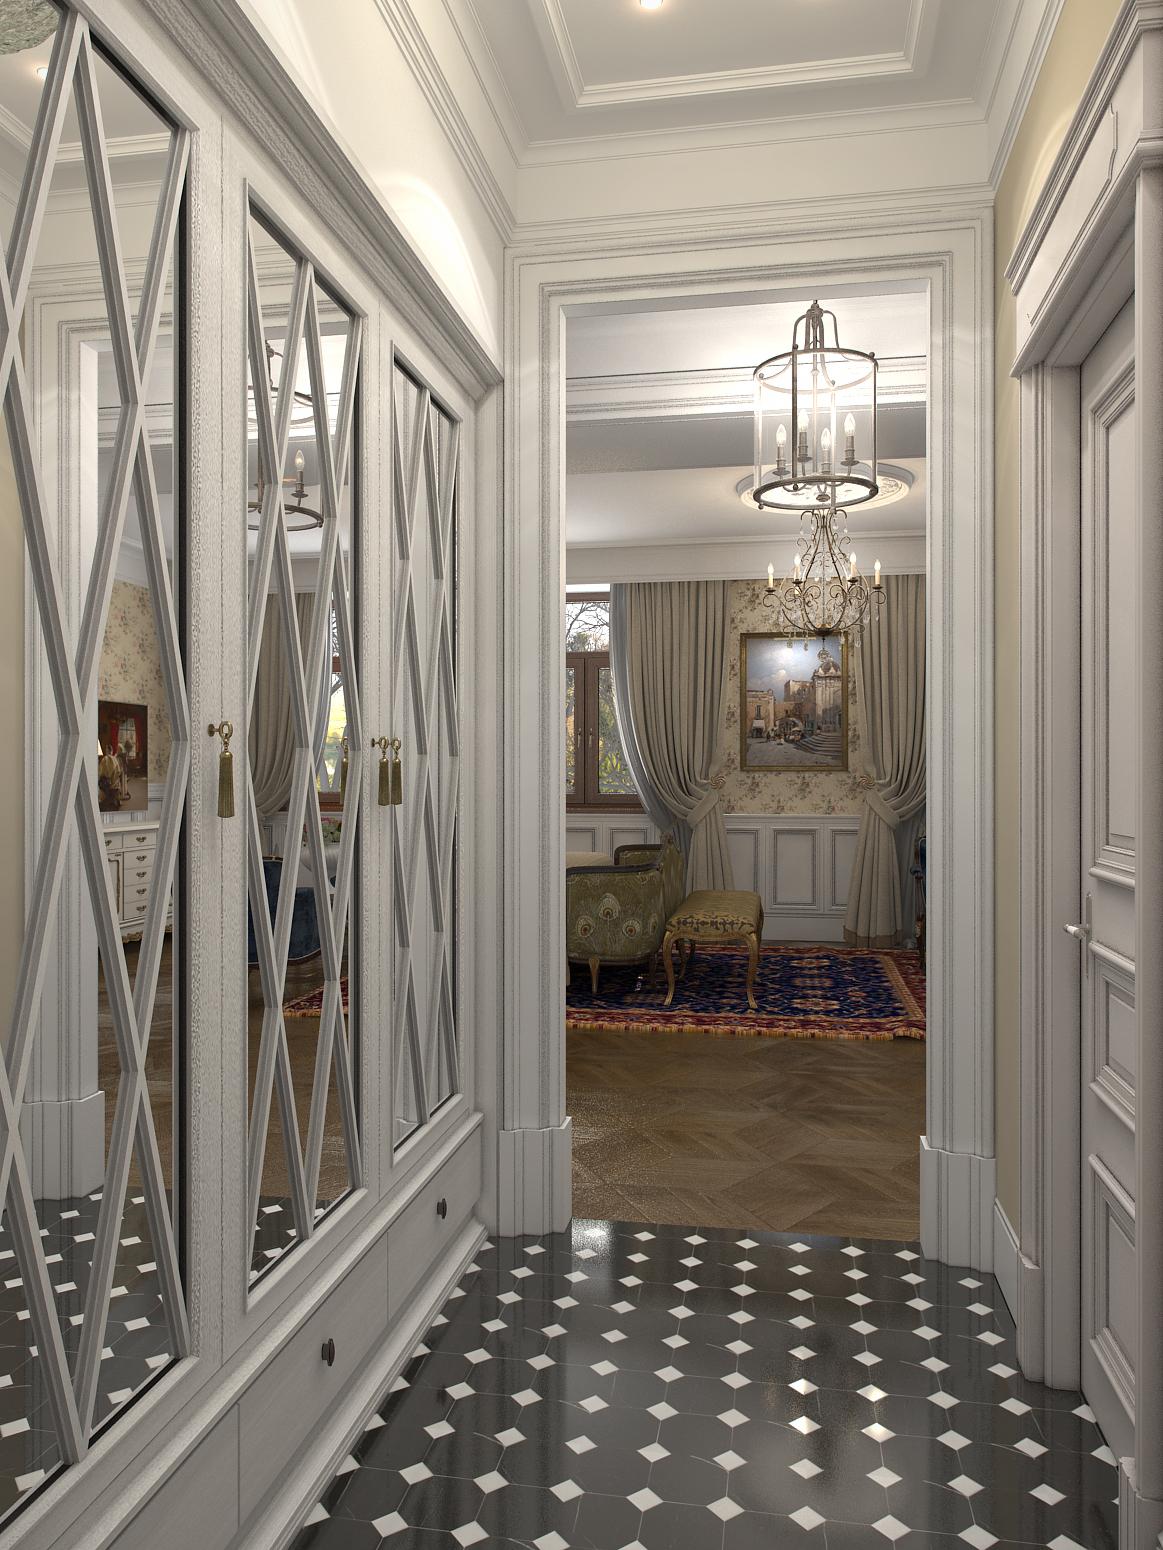 Darya girina interior design march 2015 - Holl